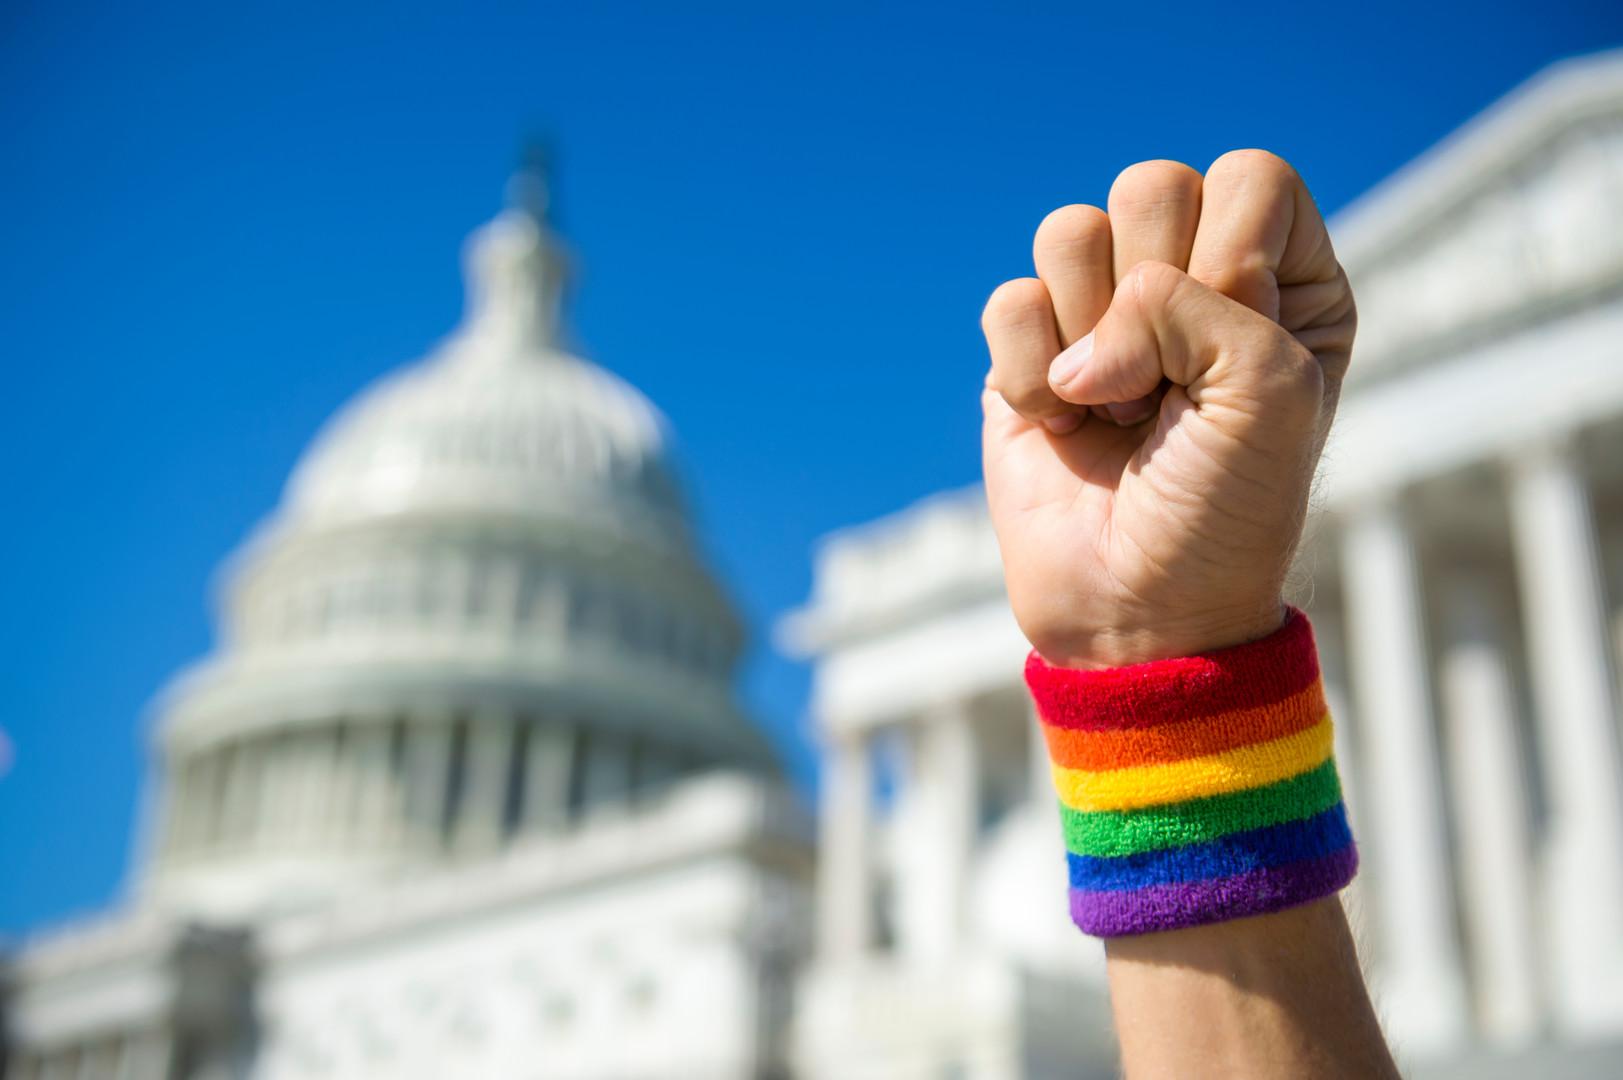 Hand wearing gay pride rainbow wristband